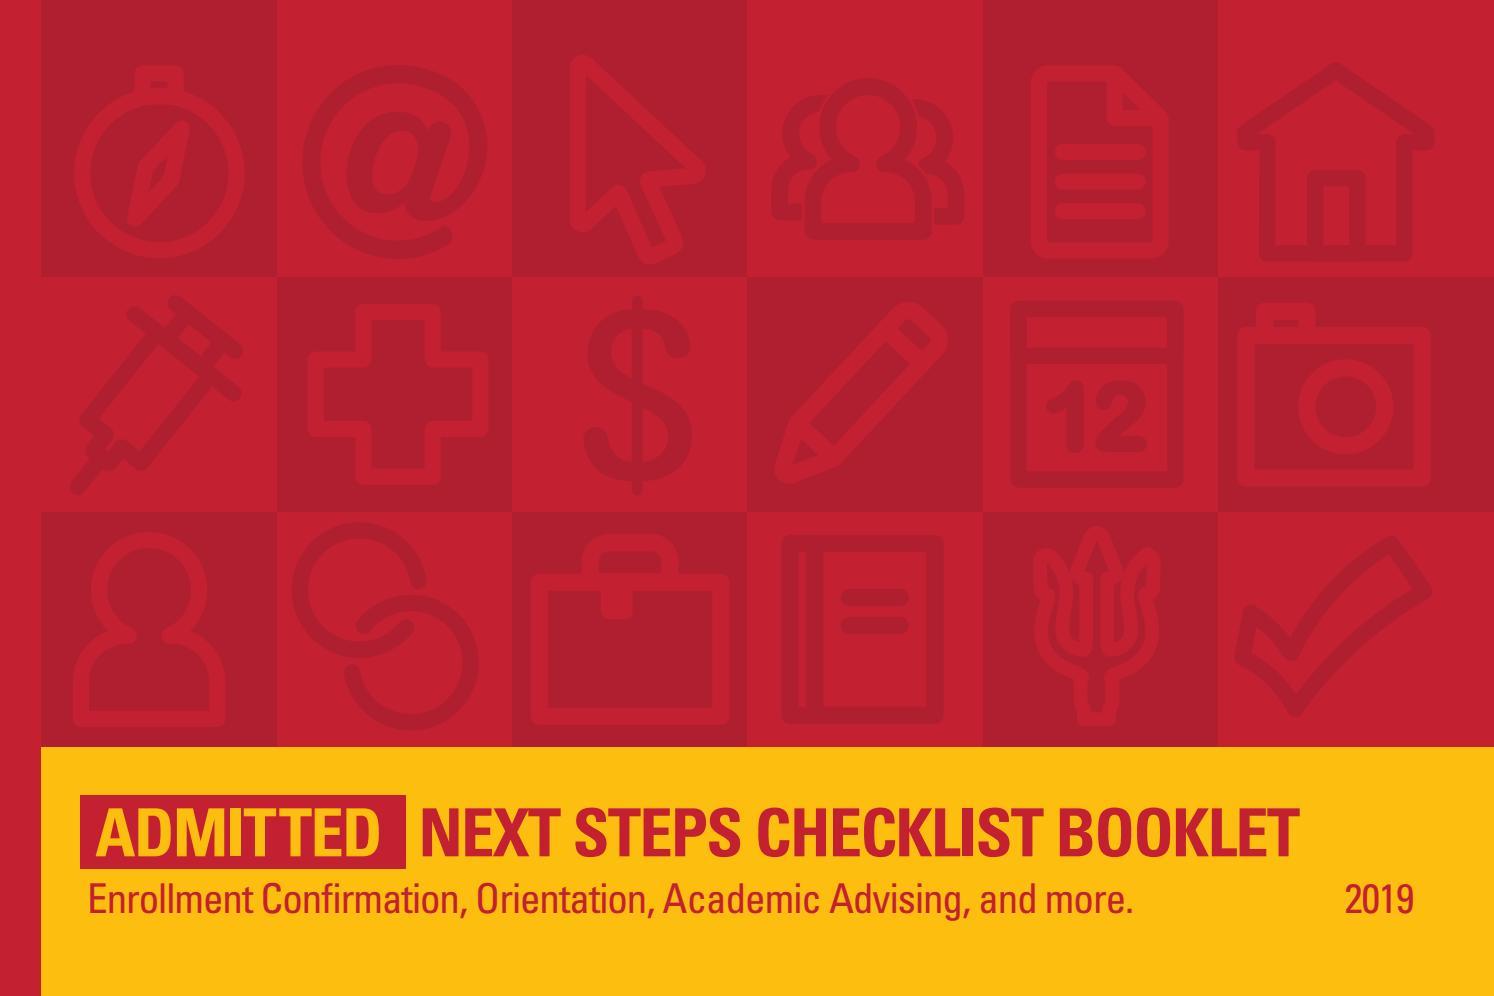 Stlcc Meramec Campus Map.Umsl Admitted Checklist Booklet 2019 By Umsl Campus Life Issuu